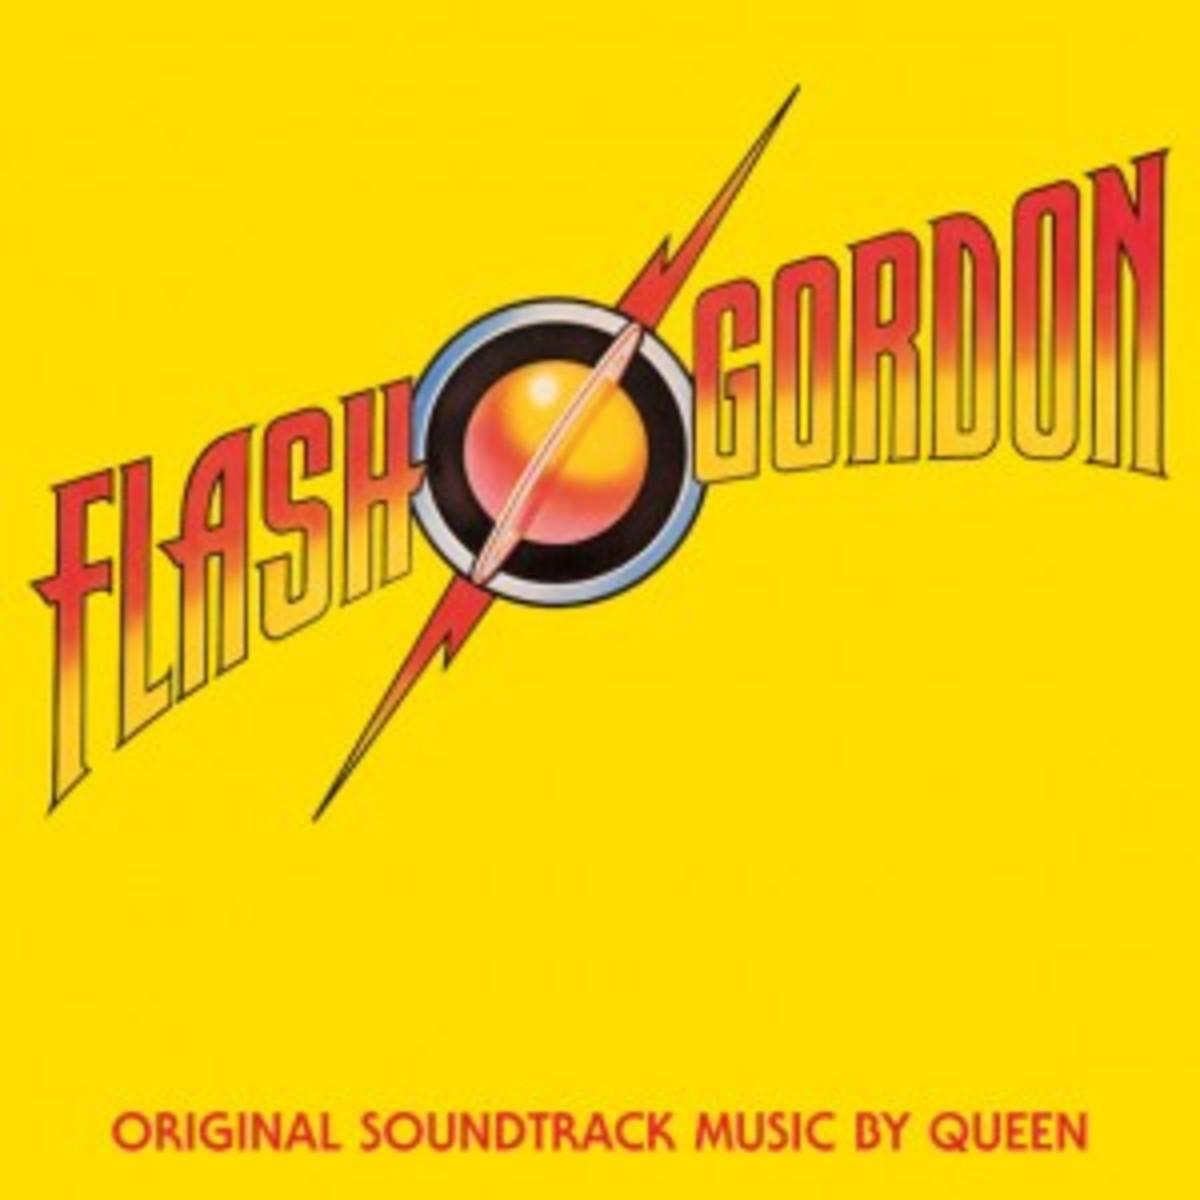 Queen Flash Gordon original soundtrack